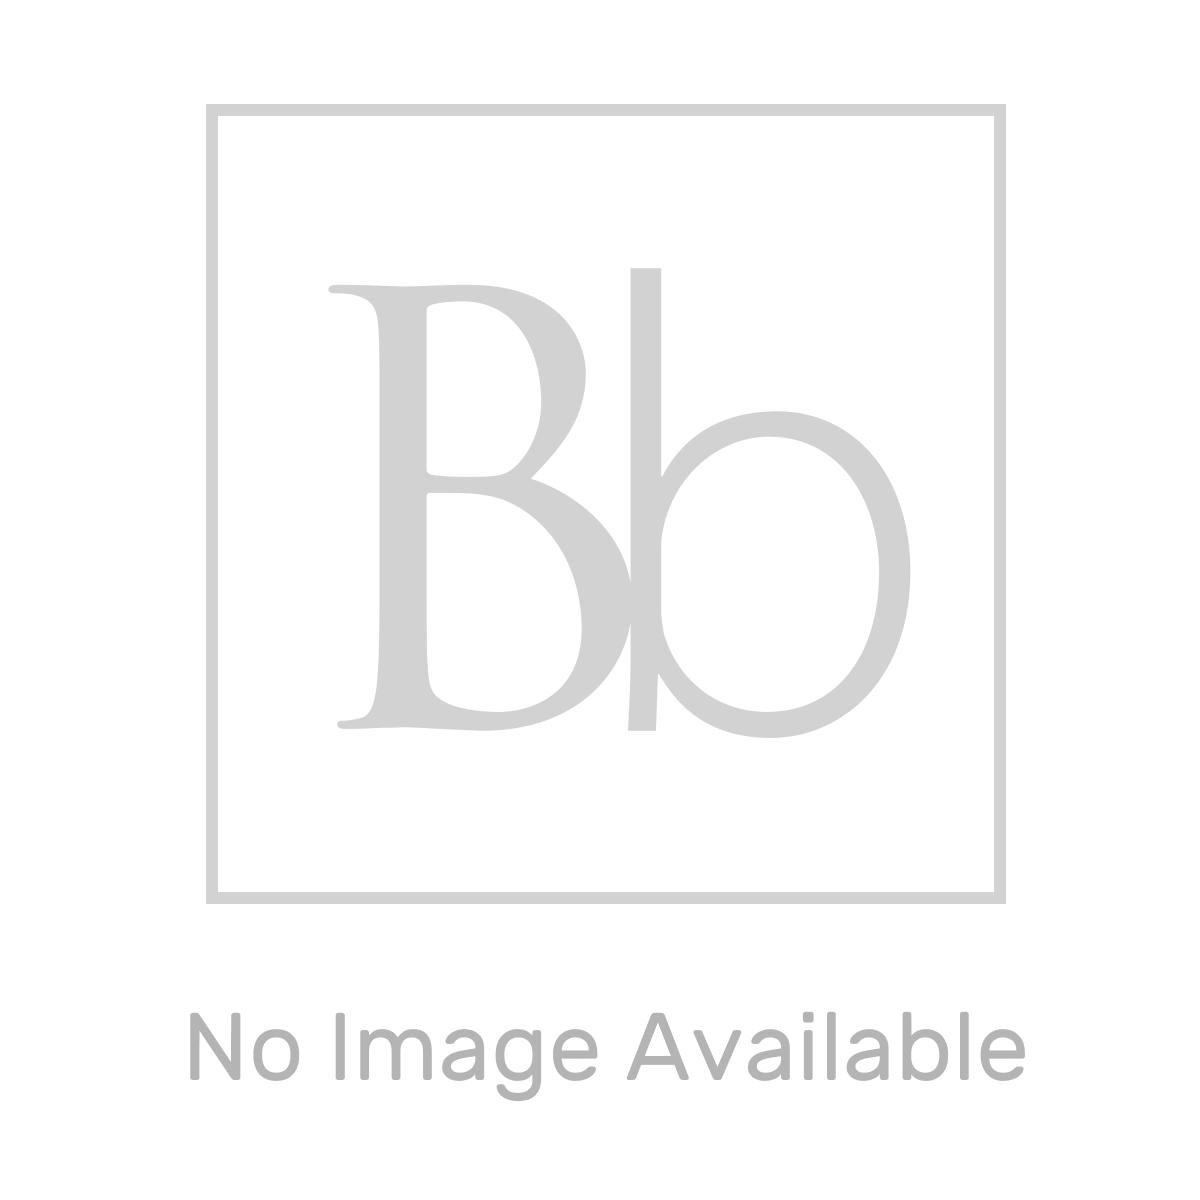 Aquadart Venturi 6 Fixed Bath Shower Screen